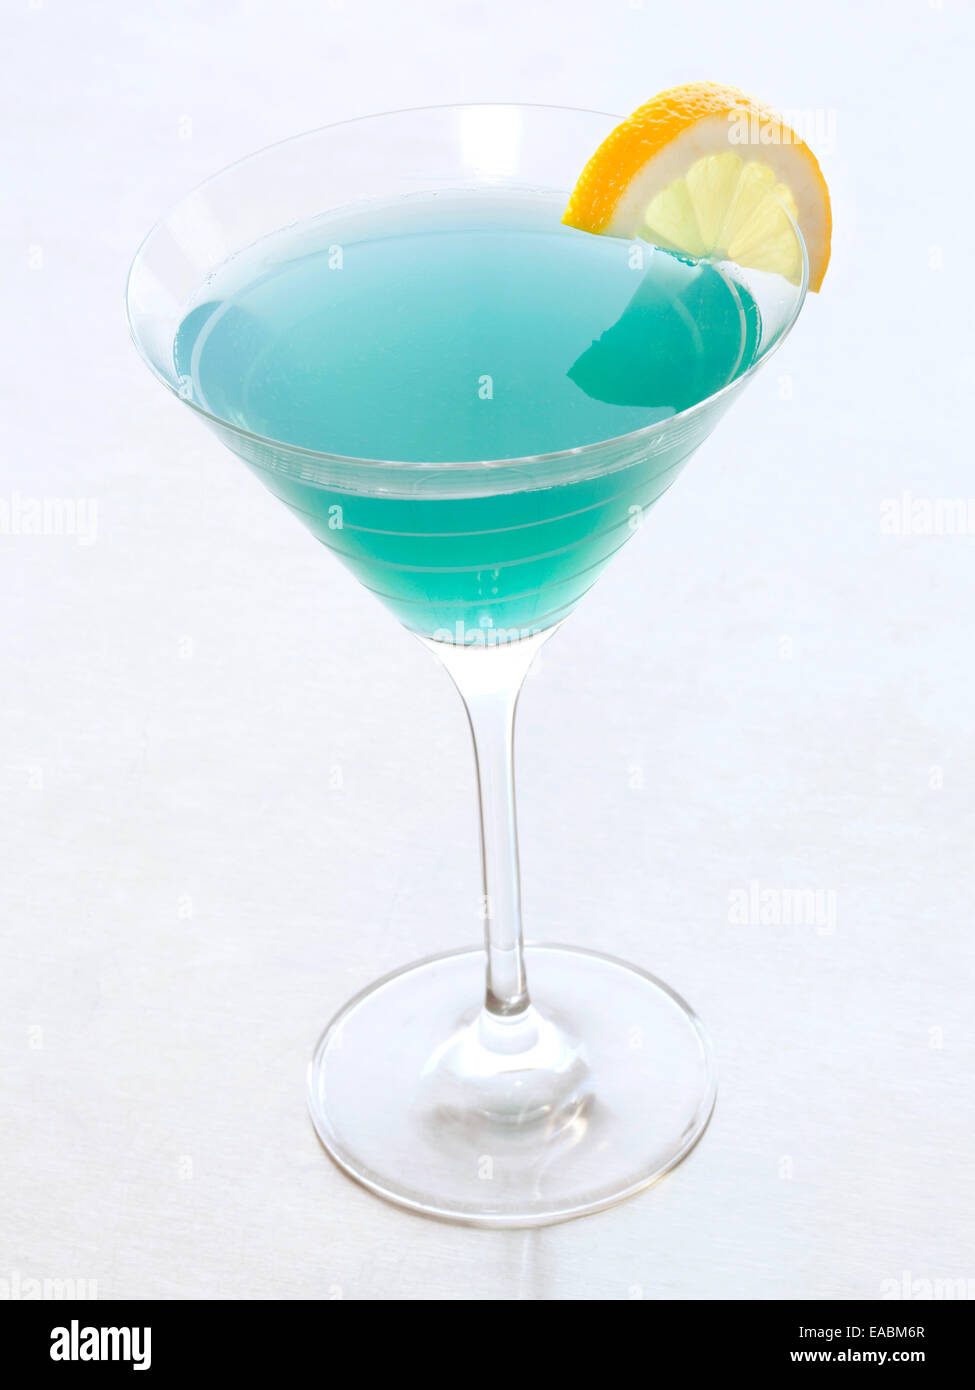 Blue Martini with slice of lemon - Stock Image